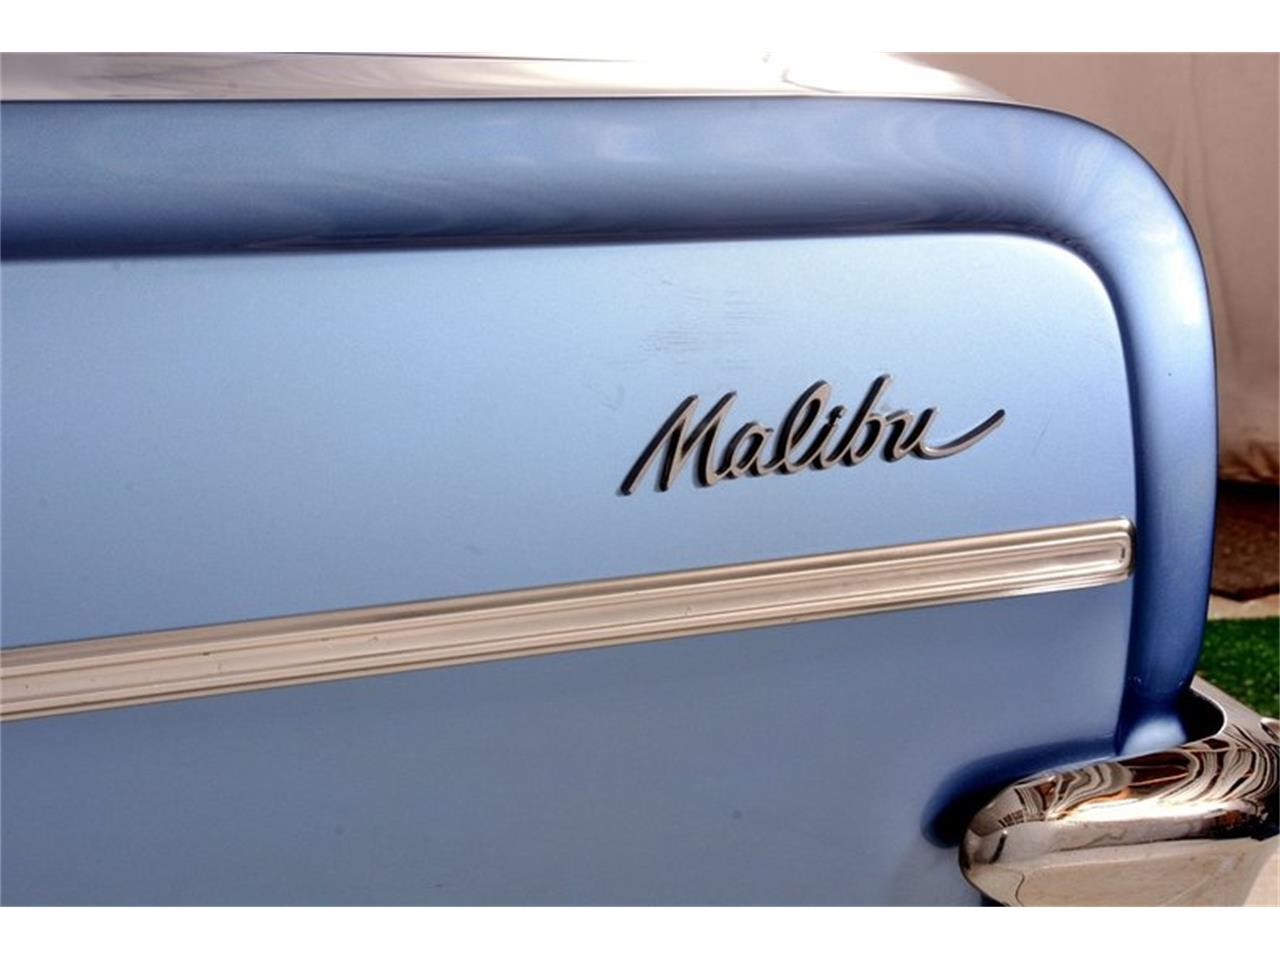 Large Picture of 1964 Chevrolet Chevelle Malibu located in Illinois - $29,998.00 - L5M9